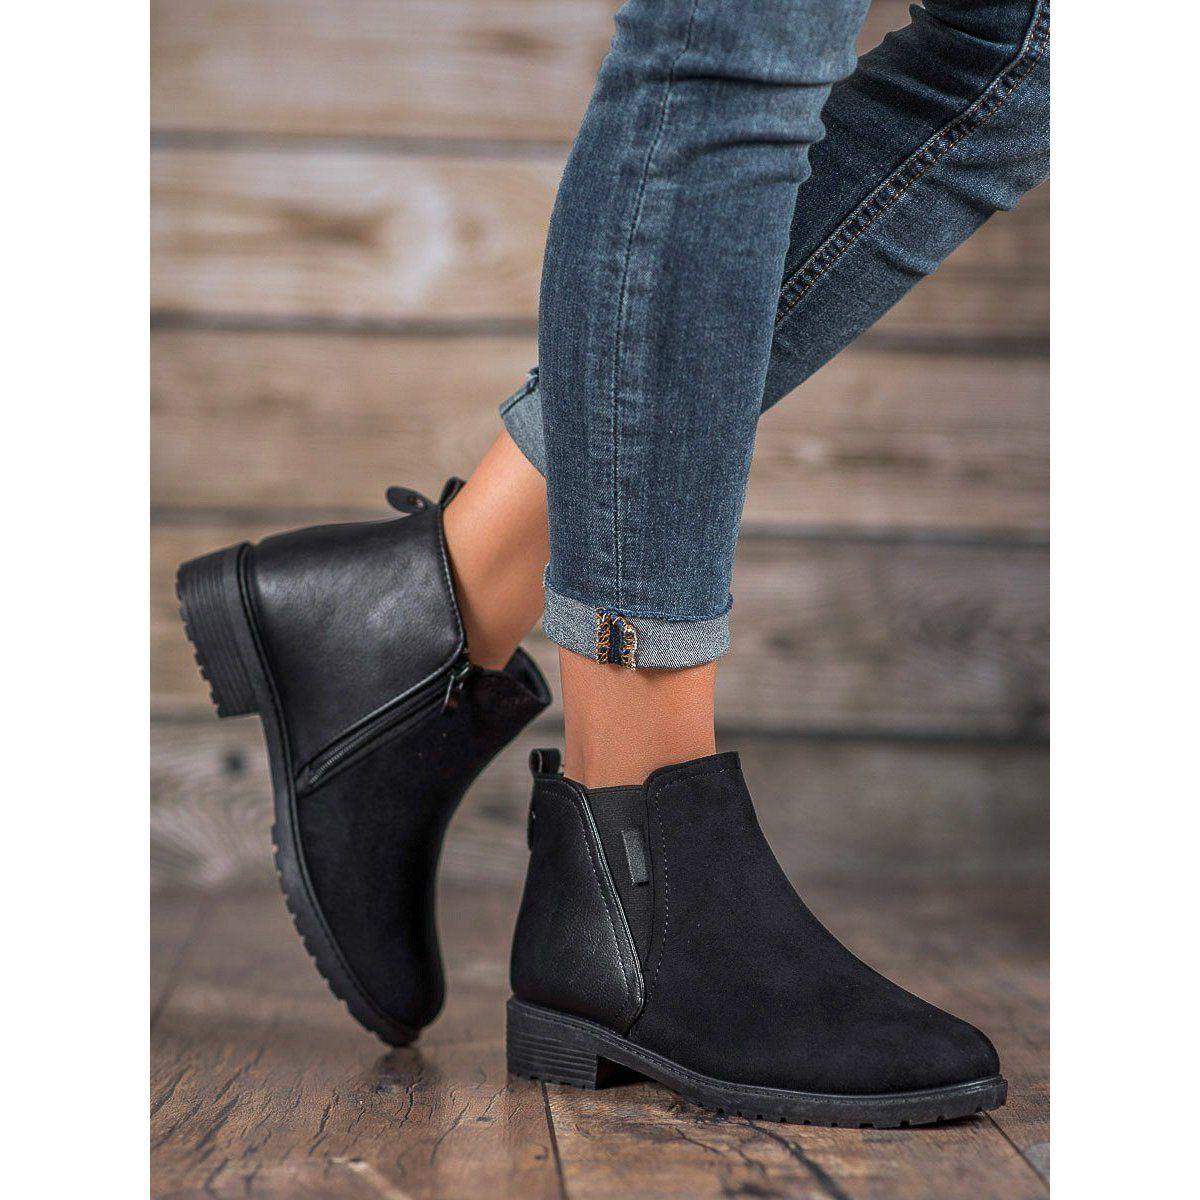 Shelovet Klasyczne Botki Czarne Boots Classic Boots Womens Boots